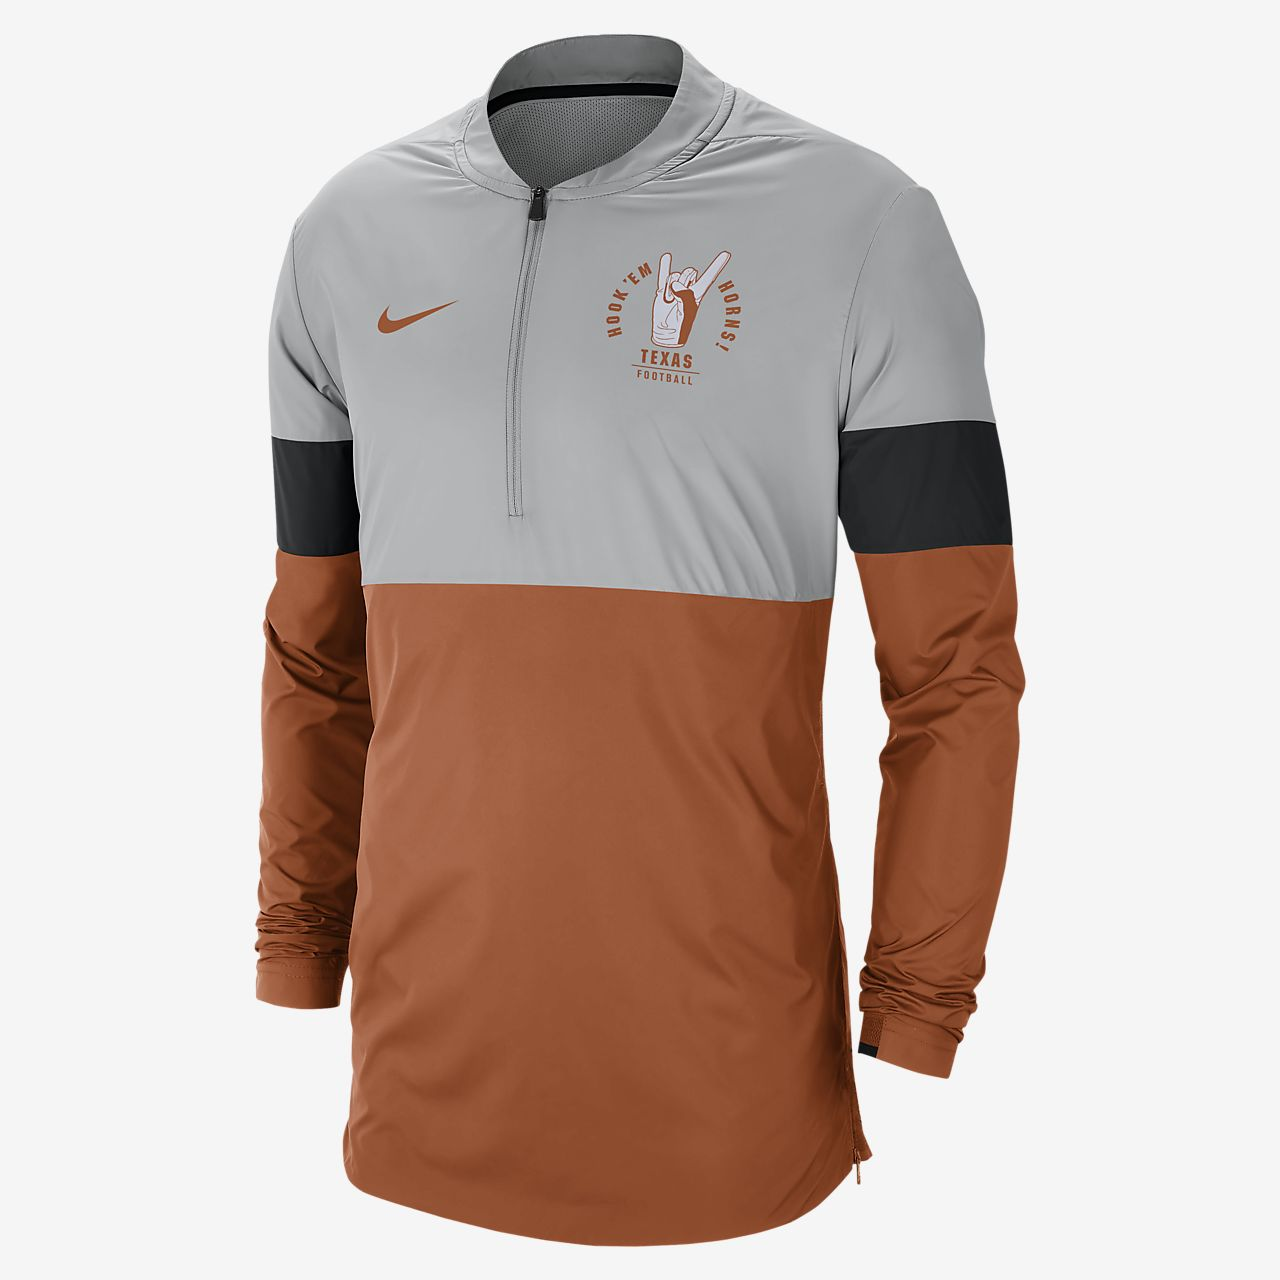 Nike College (Texas) Men's Jacket